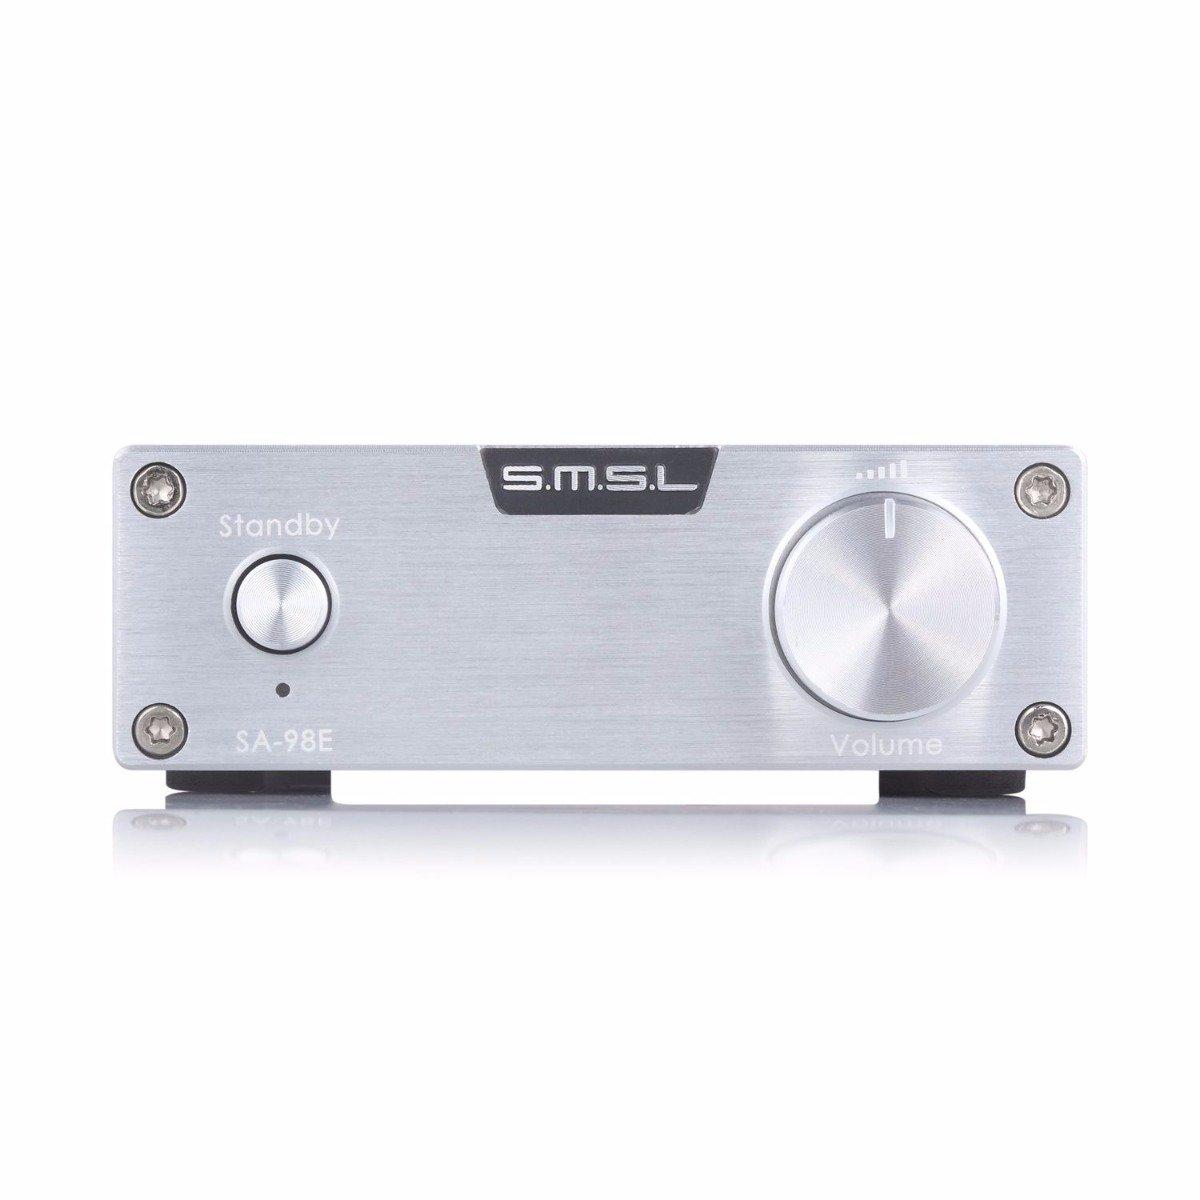 SMSL SA-98E SA-98E TDA7498E HiFiステレオデジタルミュージックMP3アンプAMP 160Wx2 B015J0PBEU +電源アダプターシルバー SMSL B015J0PBEU, 赤ちゃんデパートニワ:bd2b50f9 --- sharoshka.org